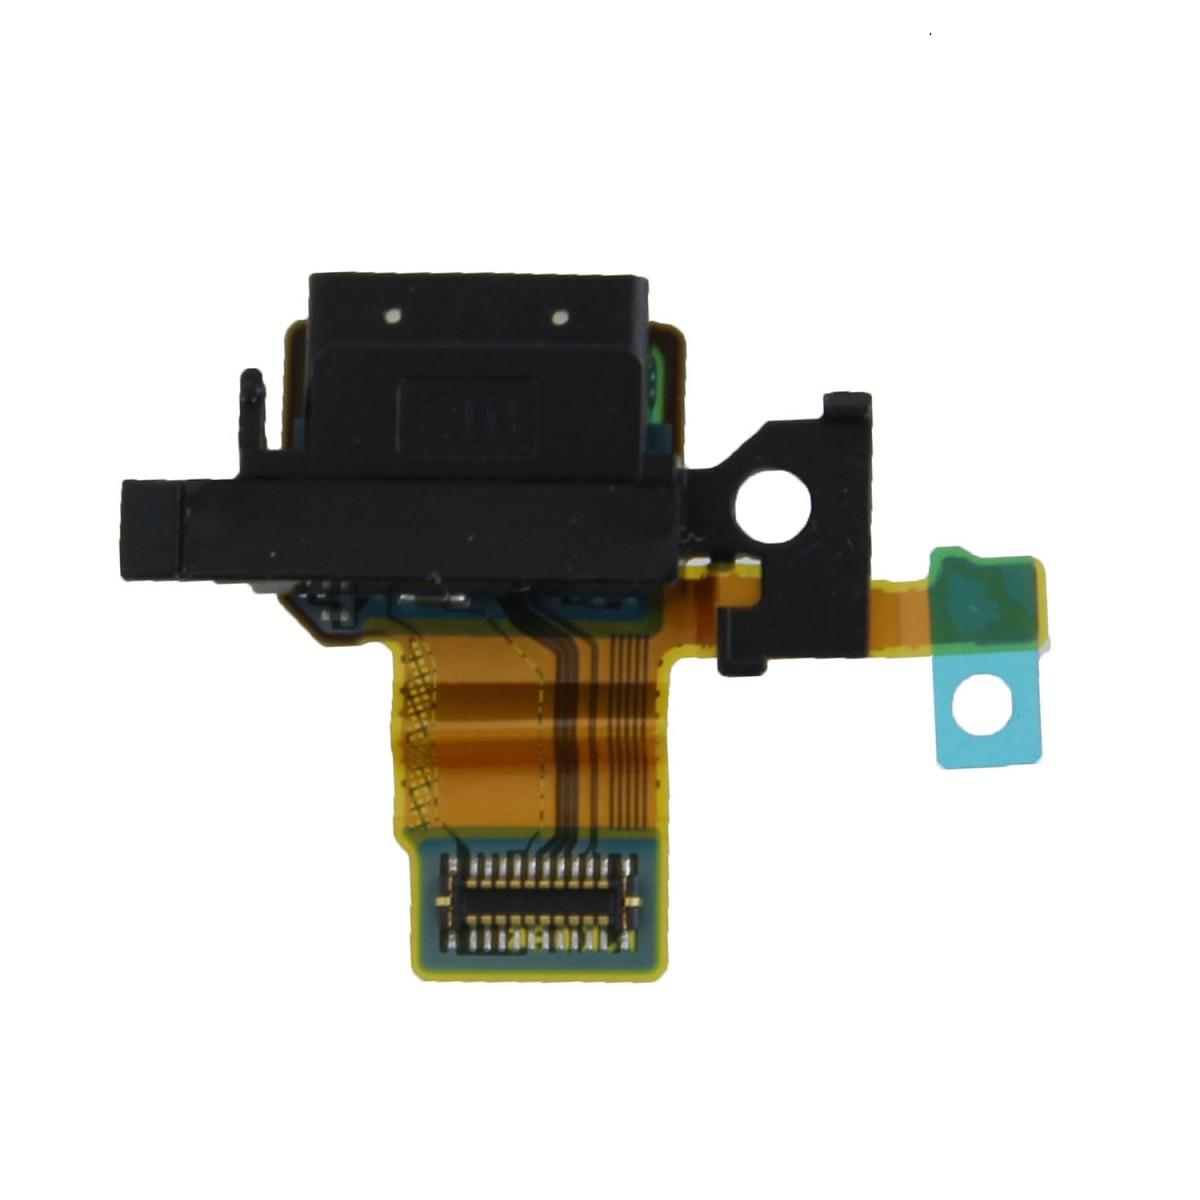 Para Sony Xperia X F5121 F5122 puerto de carga cable flexible de conector Dock